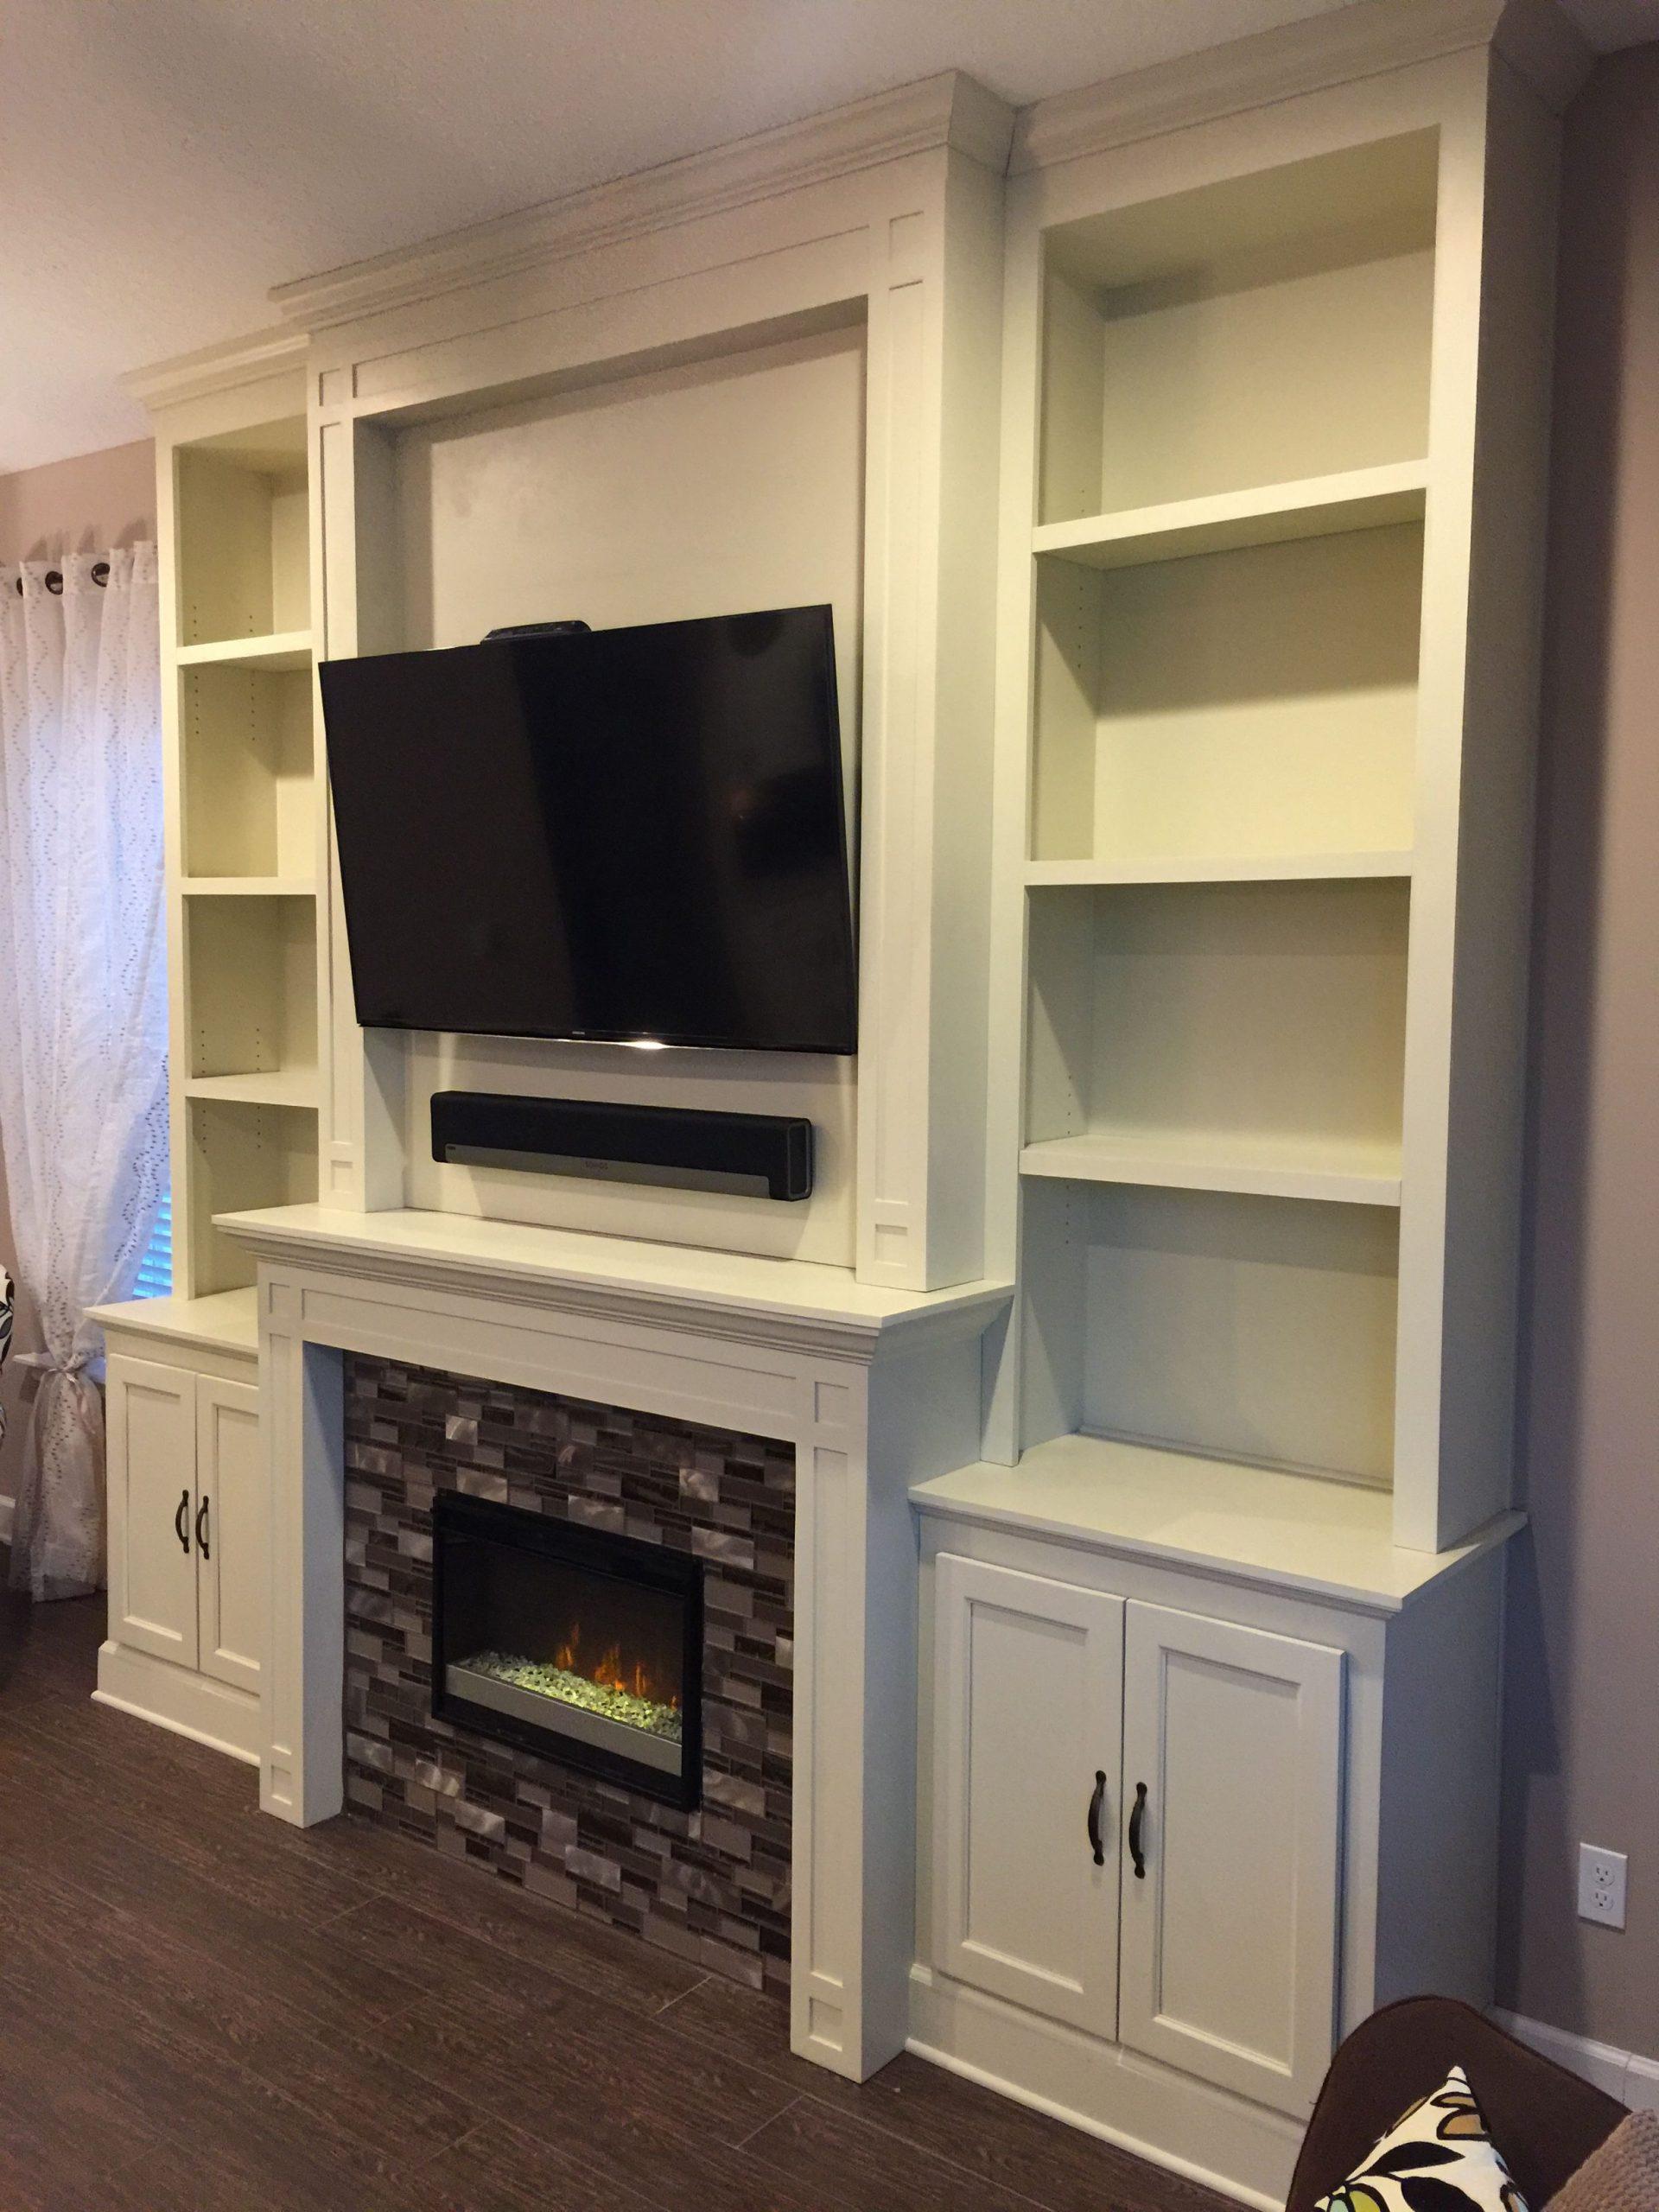 Electric Fireplace with Bookshelf Inspirational Electric Fireplace Built In Bookcases • Deck Storage Box Ideas